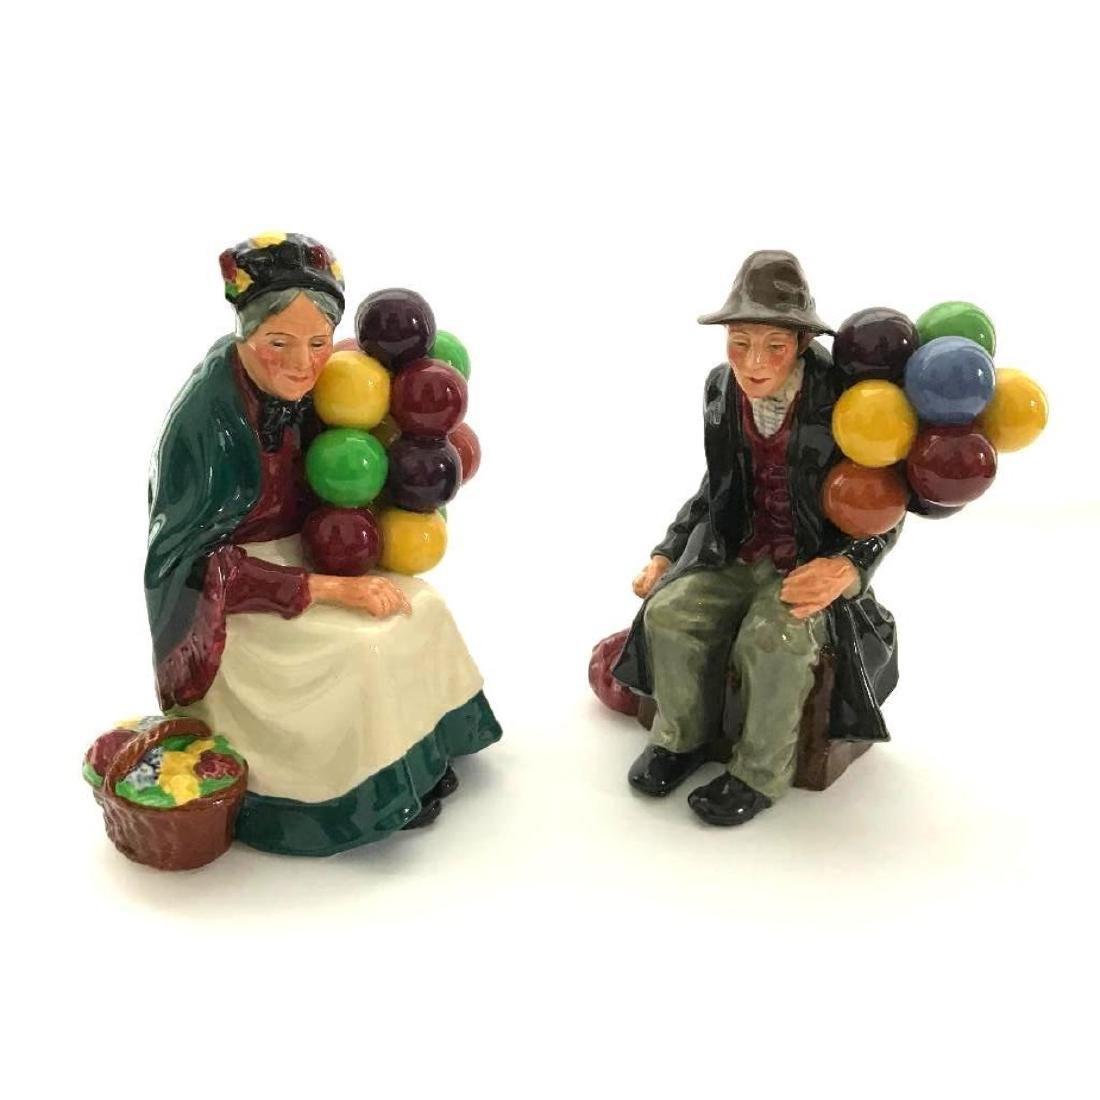 Pair of Retired Royal Doulton Balloon Sellers Porcelain